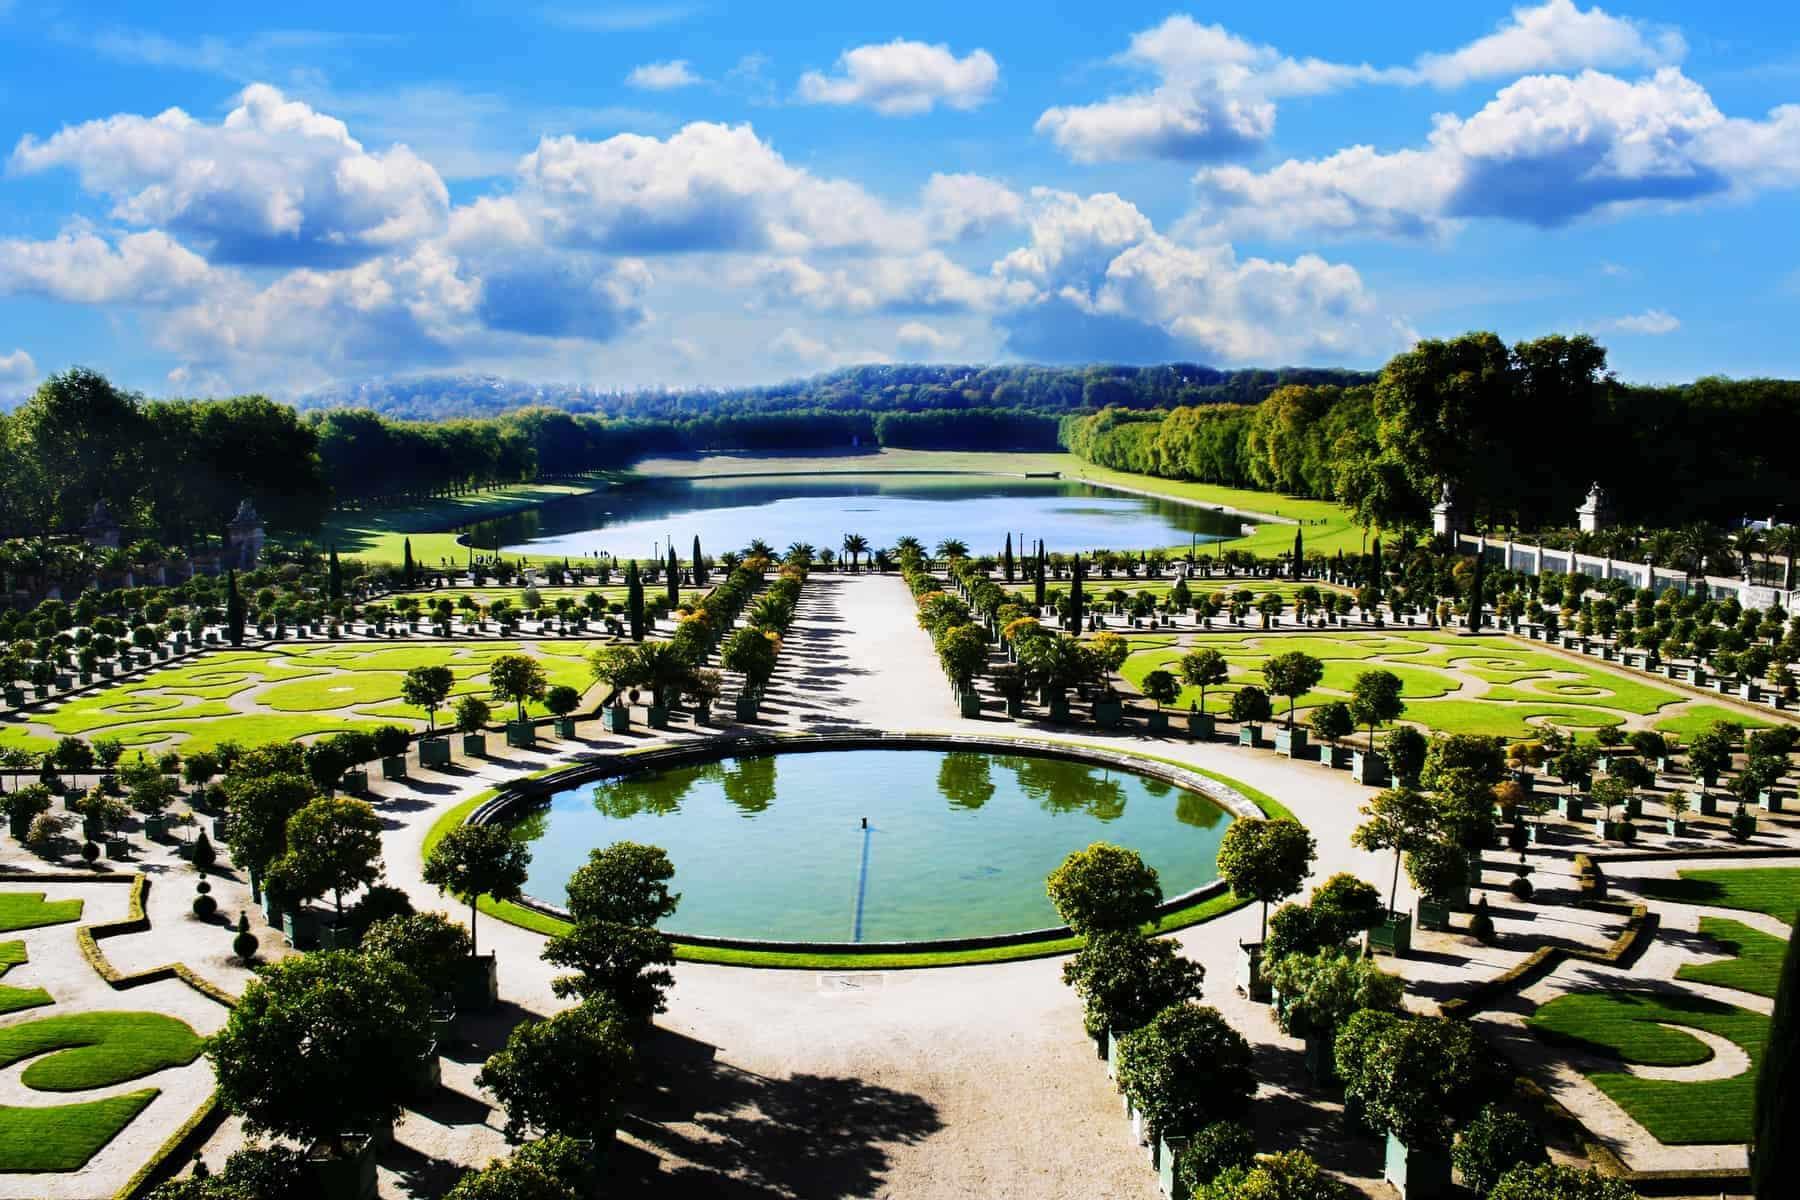 Versailles, royal garden i Paris